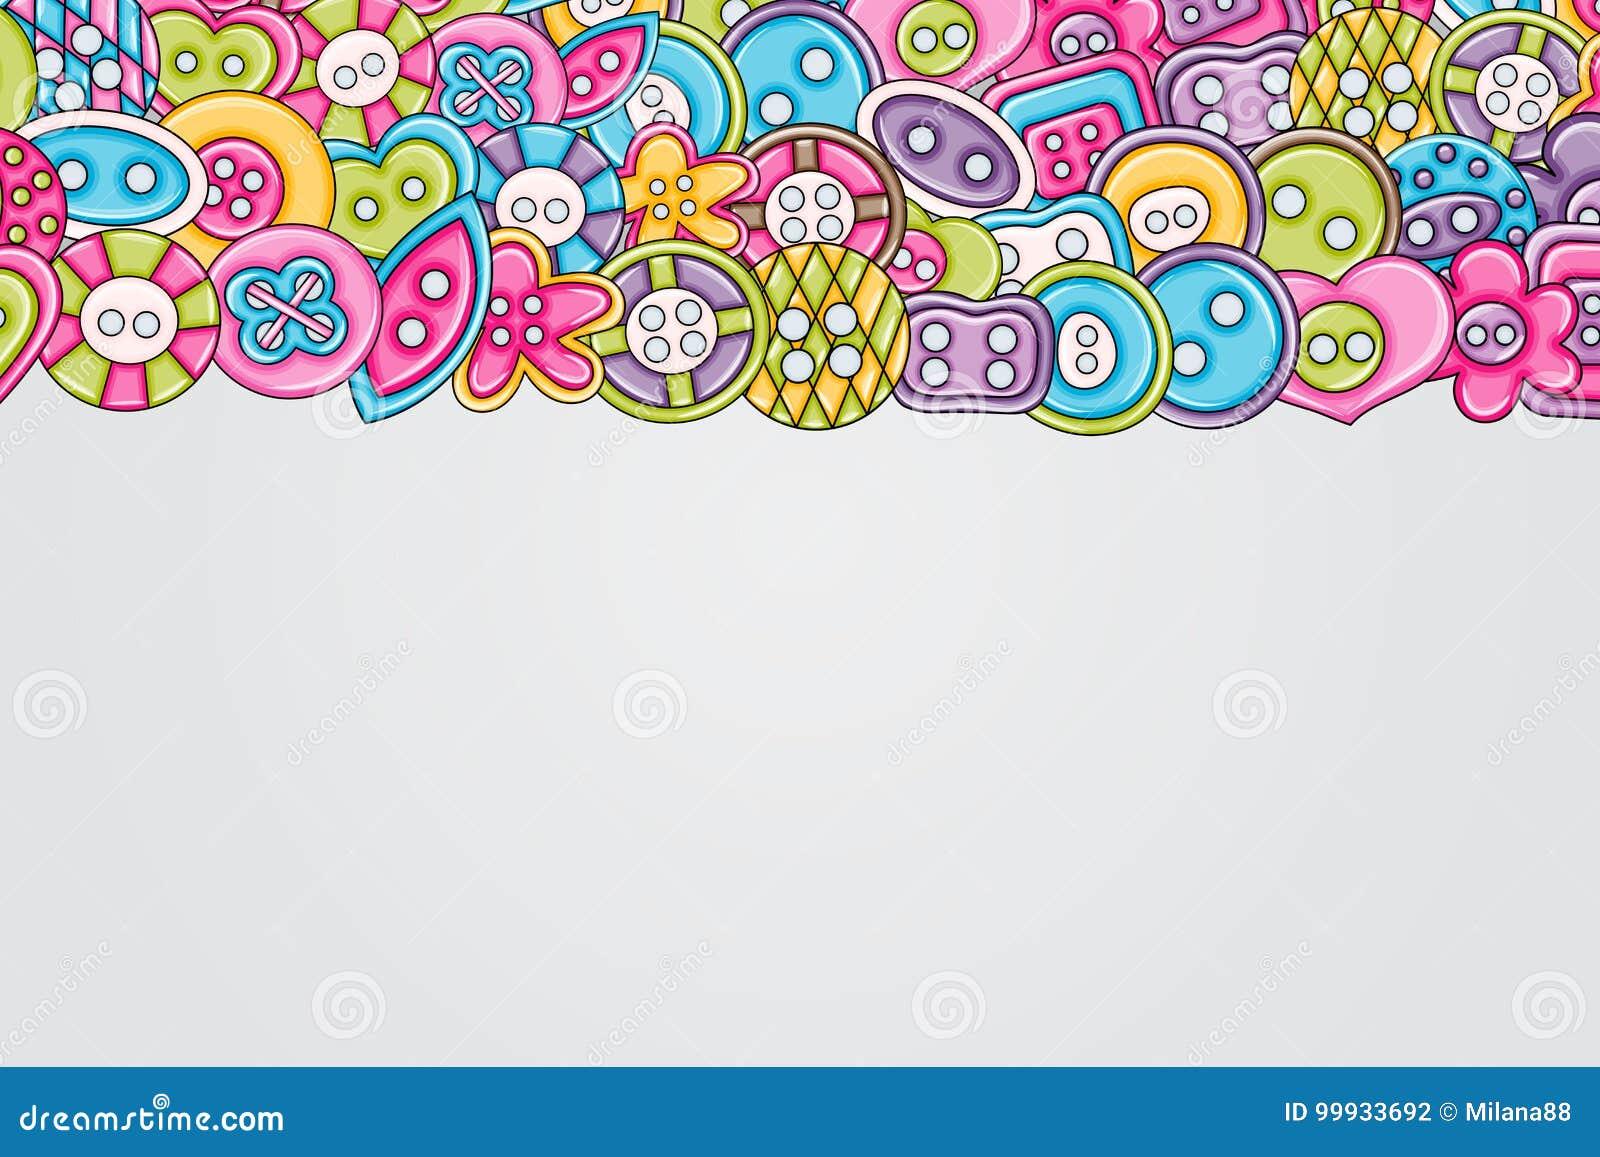 Sewing Buttons Handmade Craft Concept 3d Cartoon Doodle Background